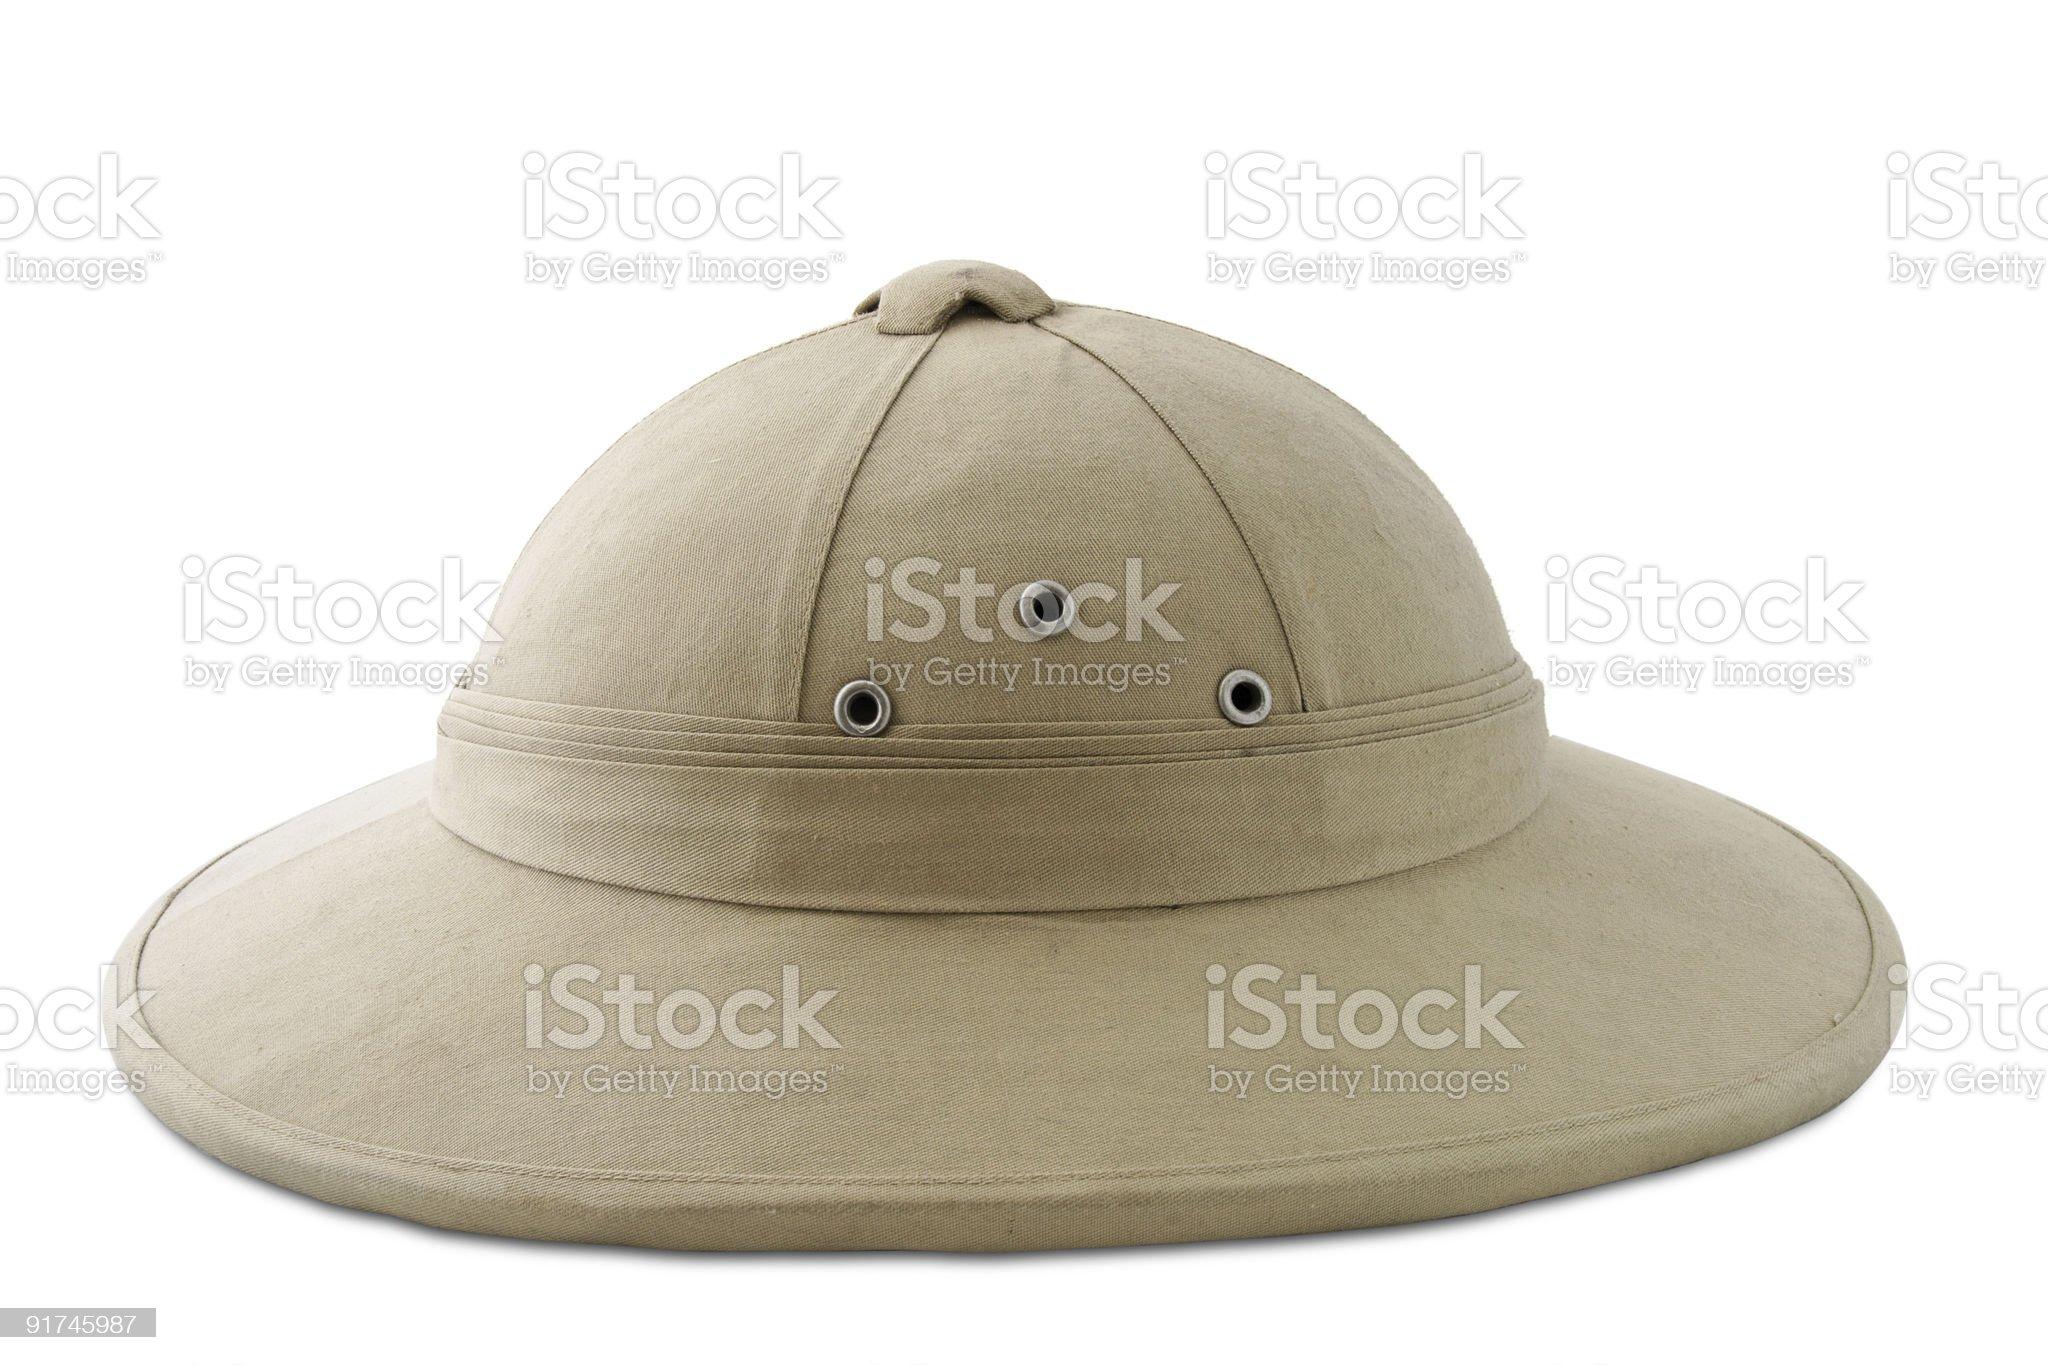 cork helmet royalty-free stock photo